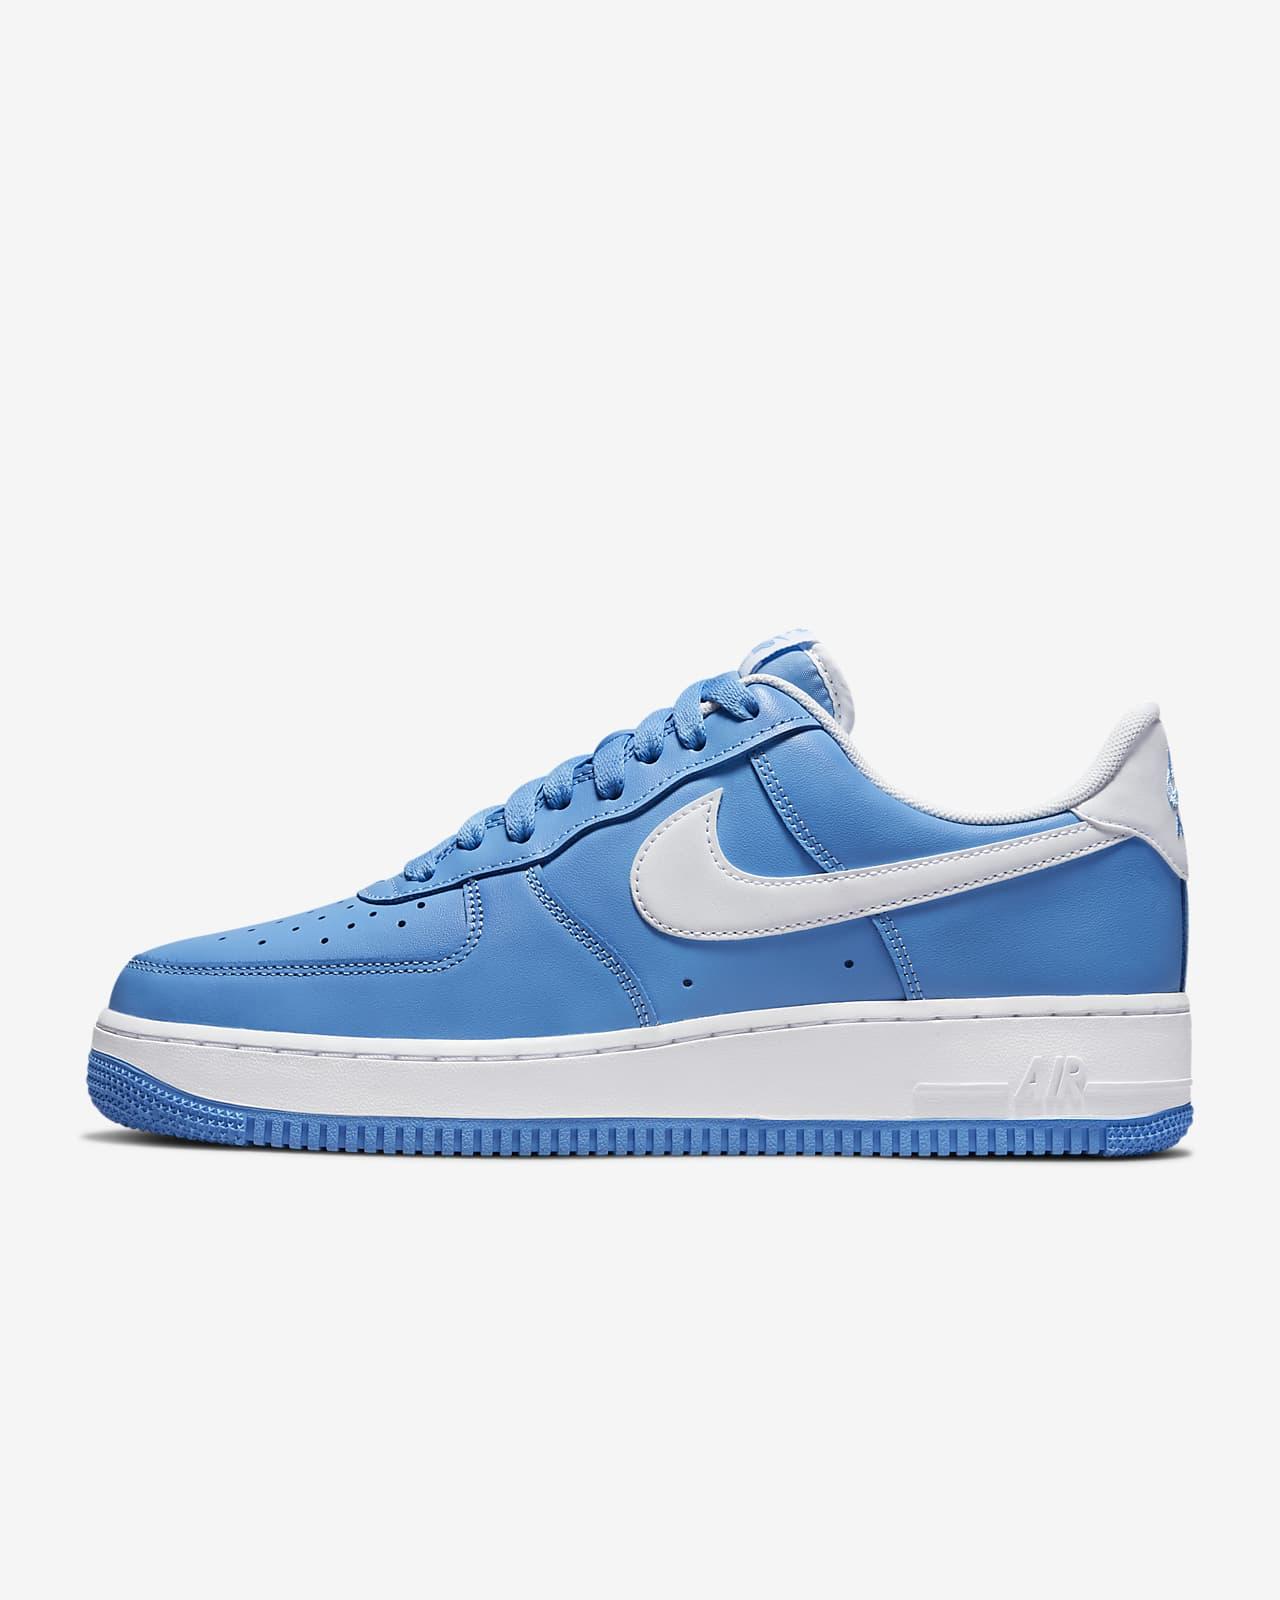 Nike Air Force 1 Low 'University Blue'